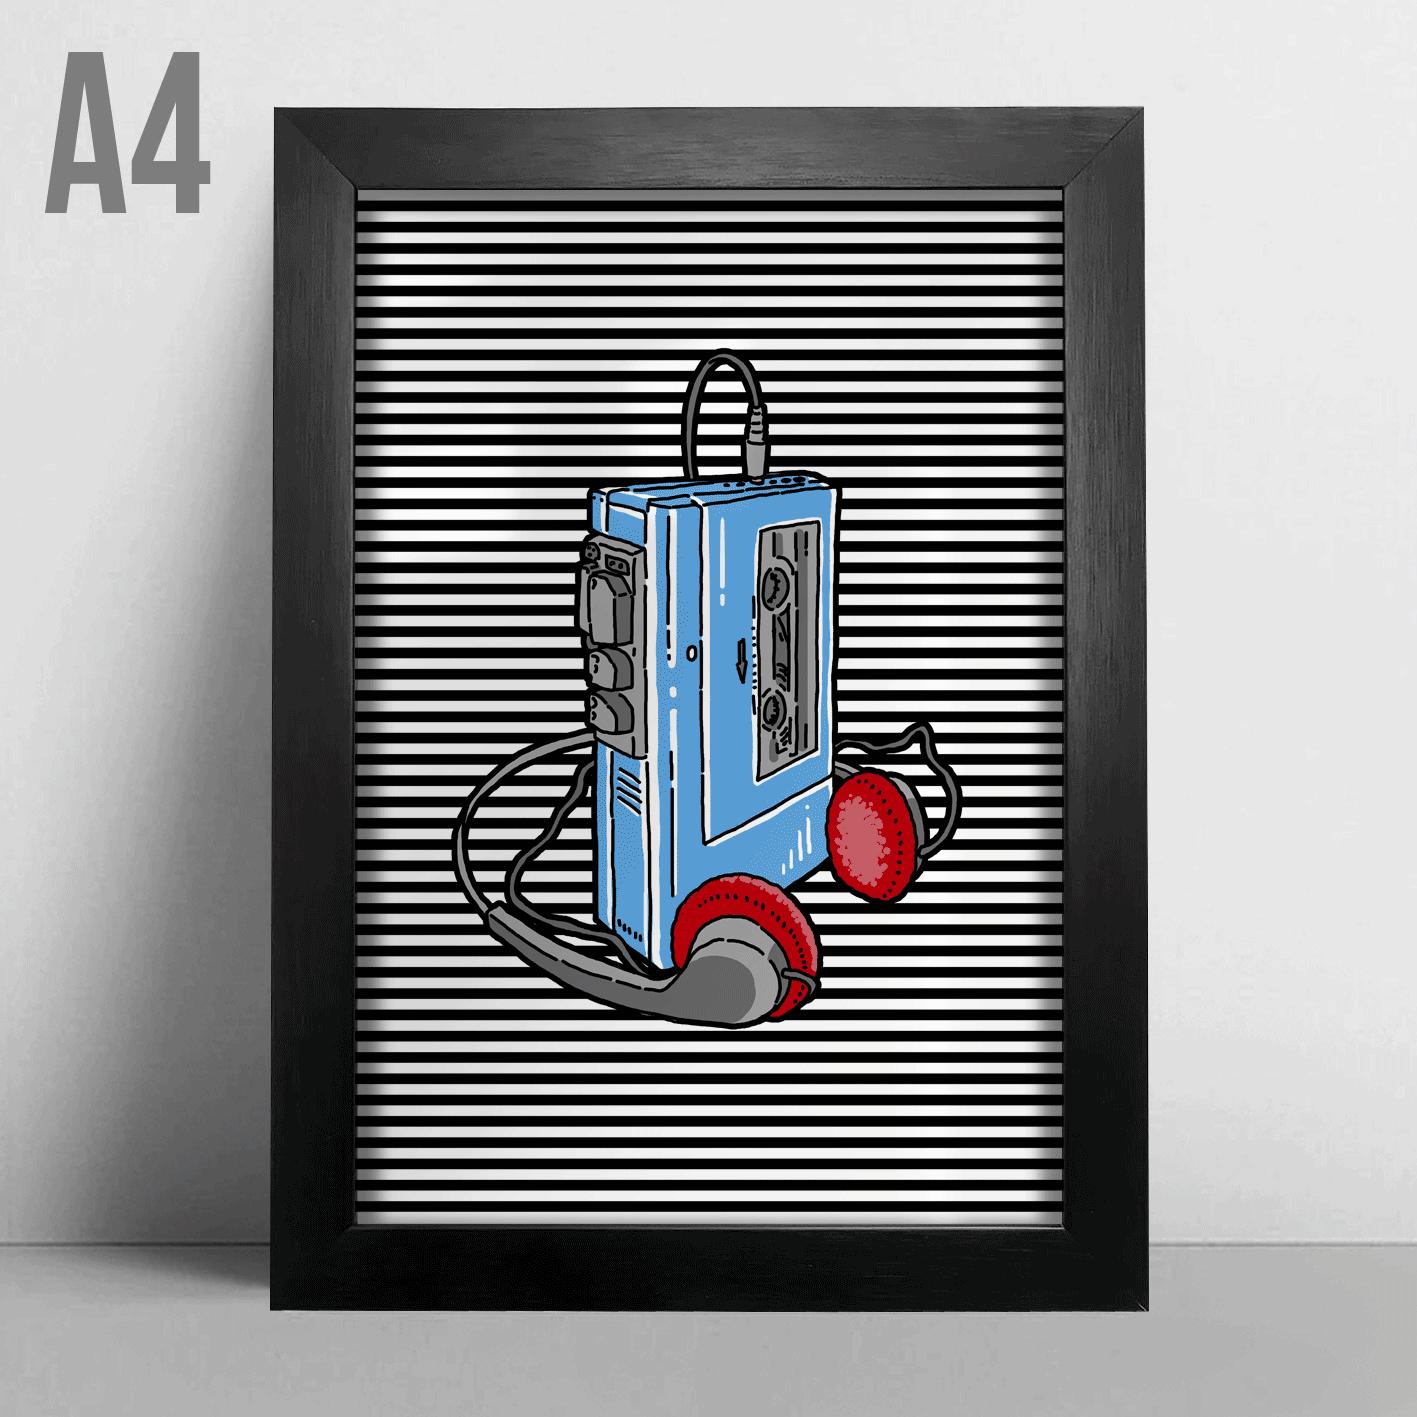 Quadro A4 - Walkman